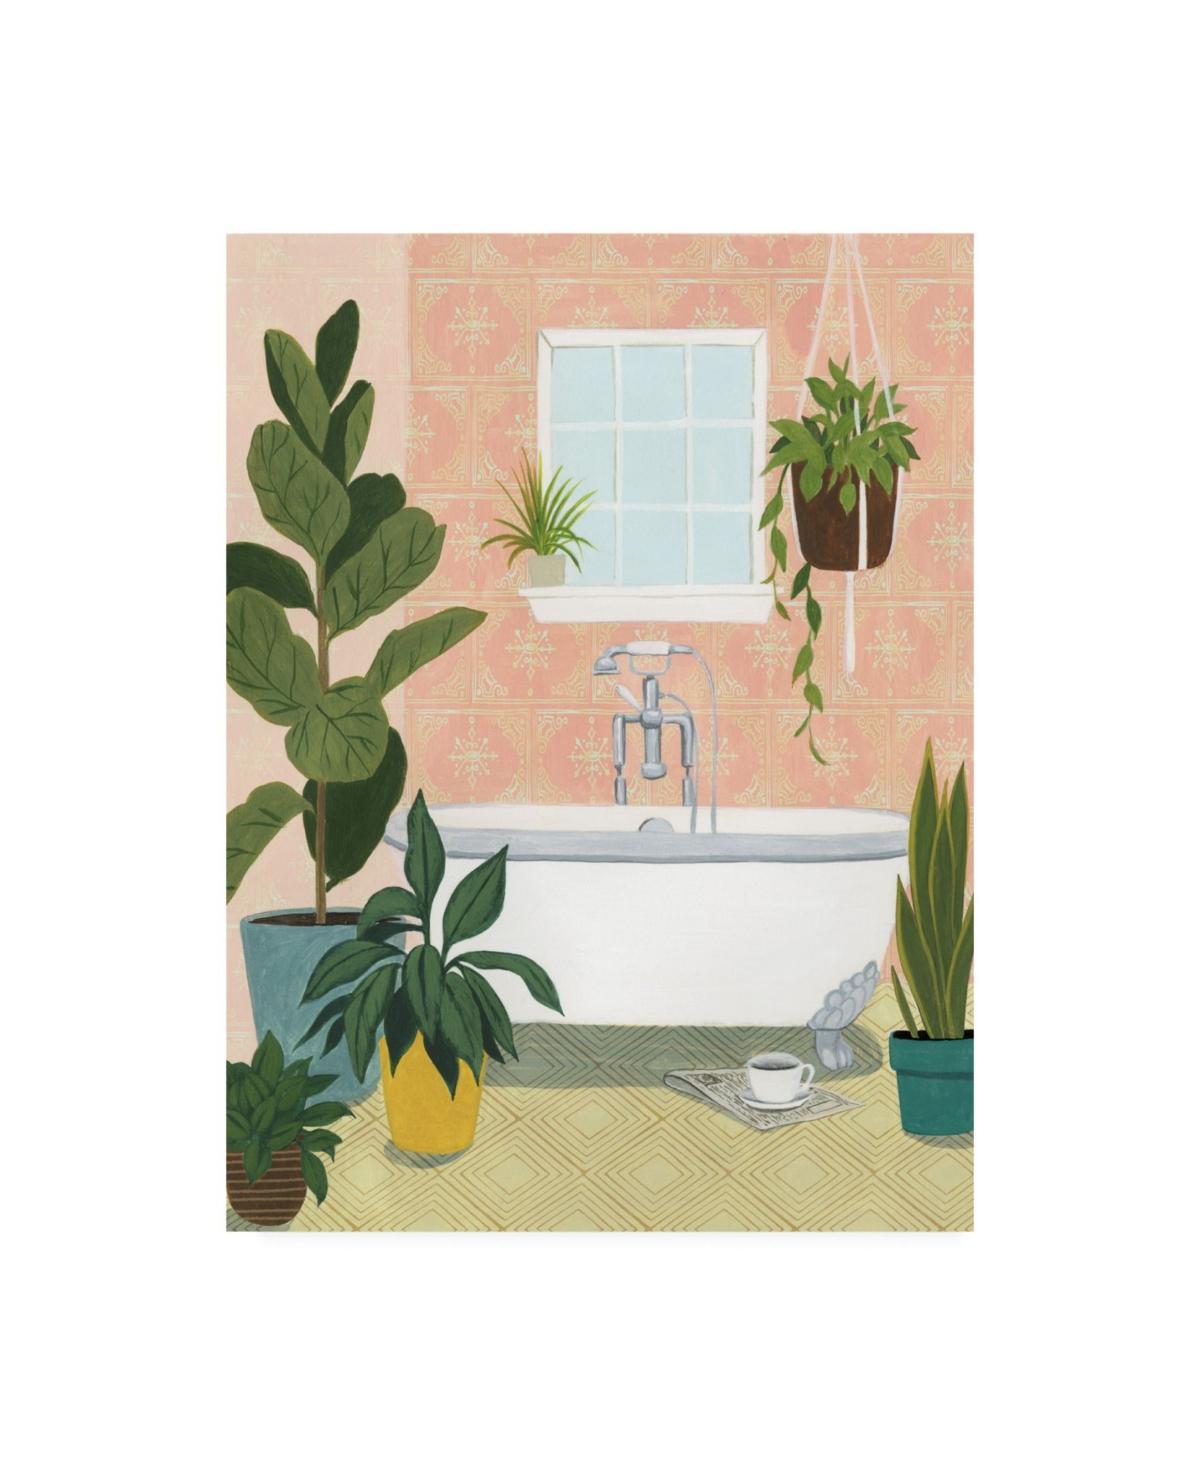 Grace Popp Bathtub Oasis Ii Canvas Art - 19.5